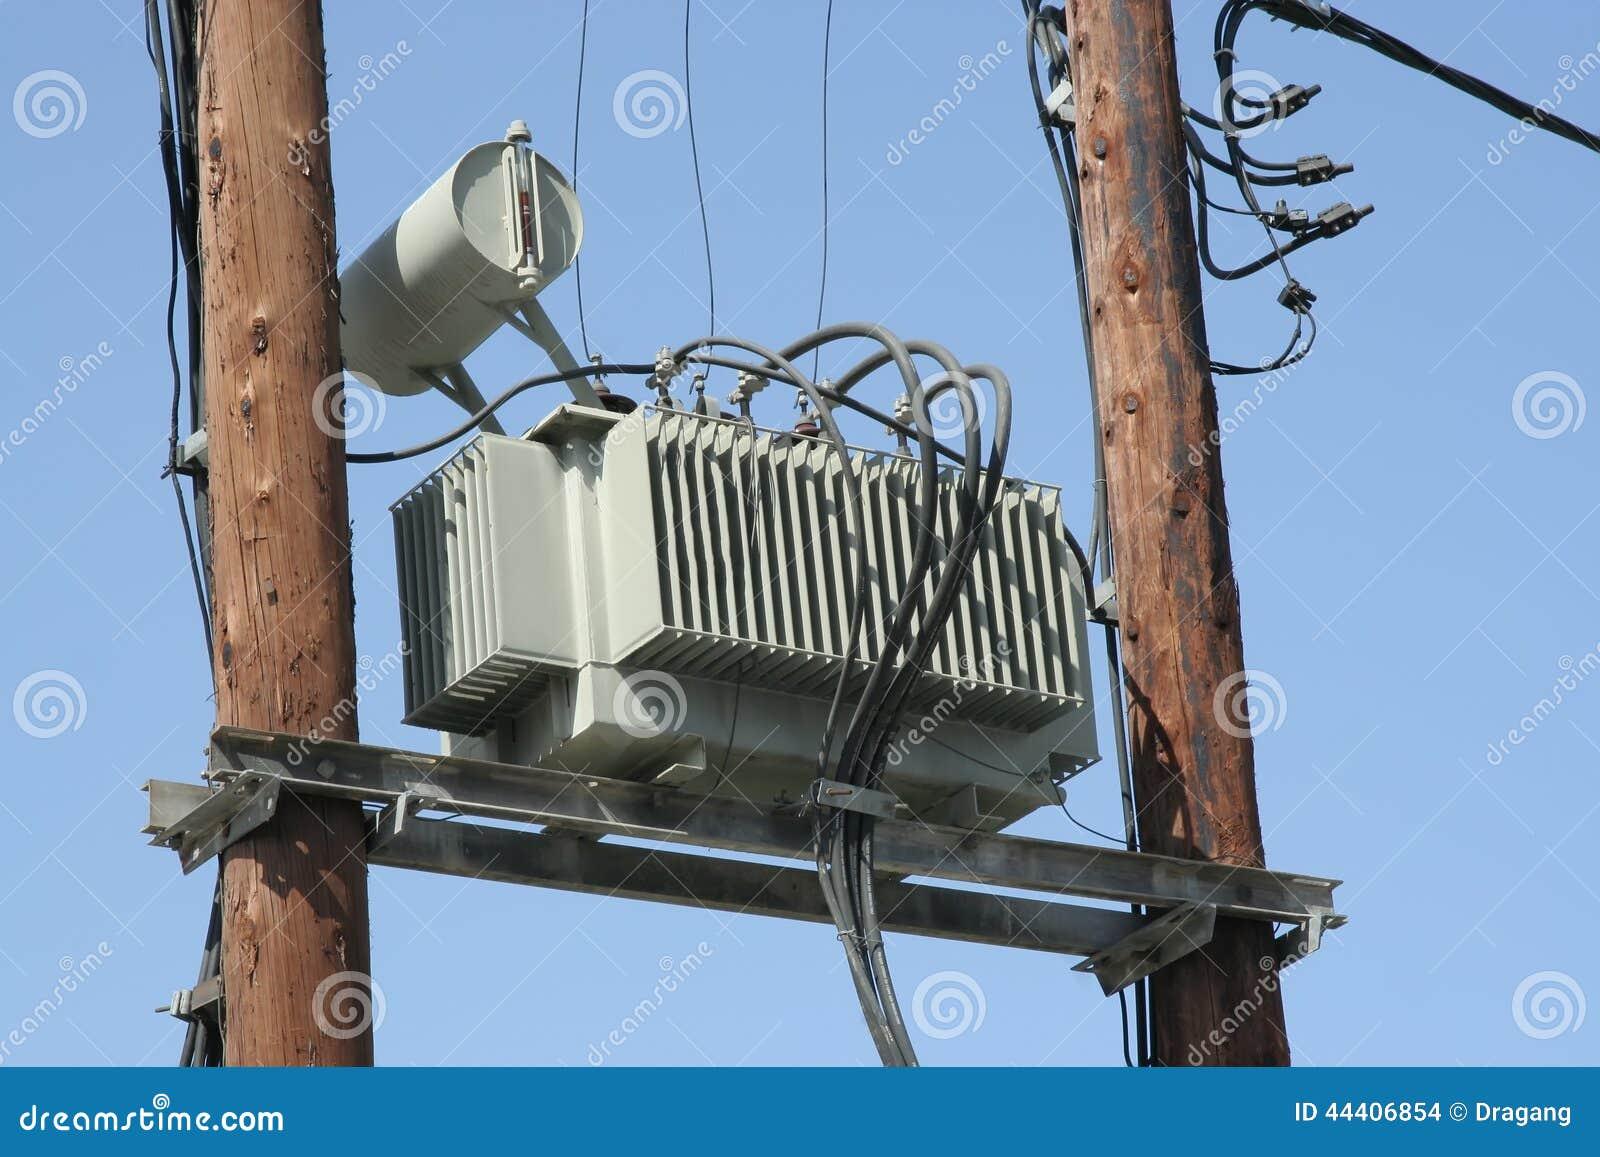 Transformer Stock Photo Image 44406854